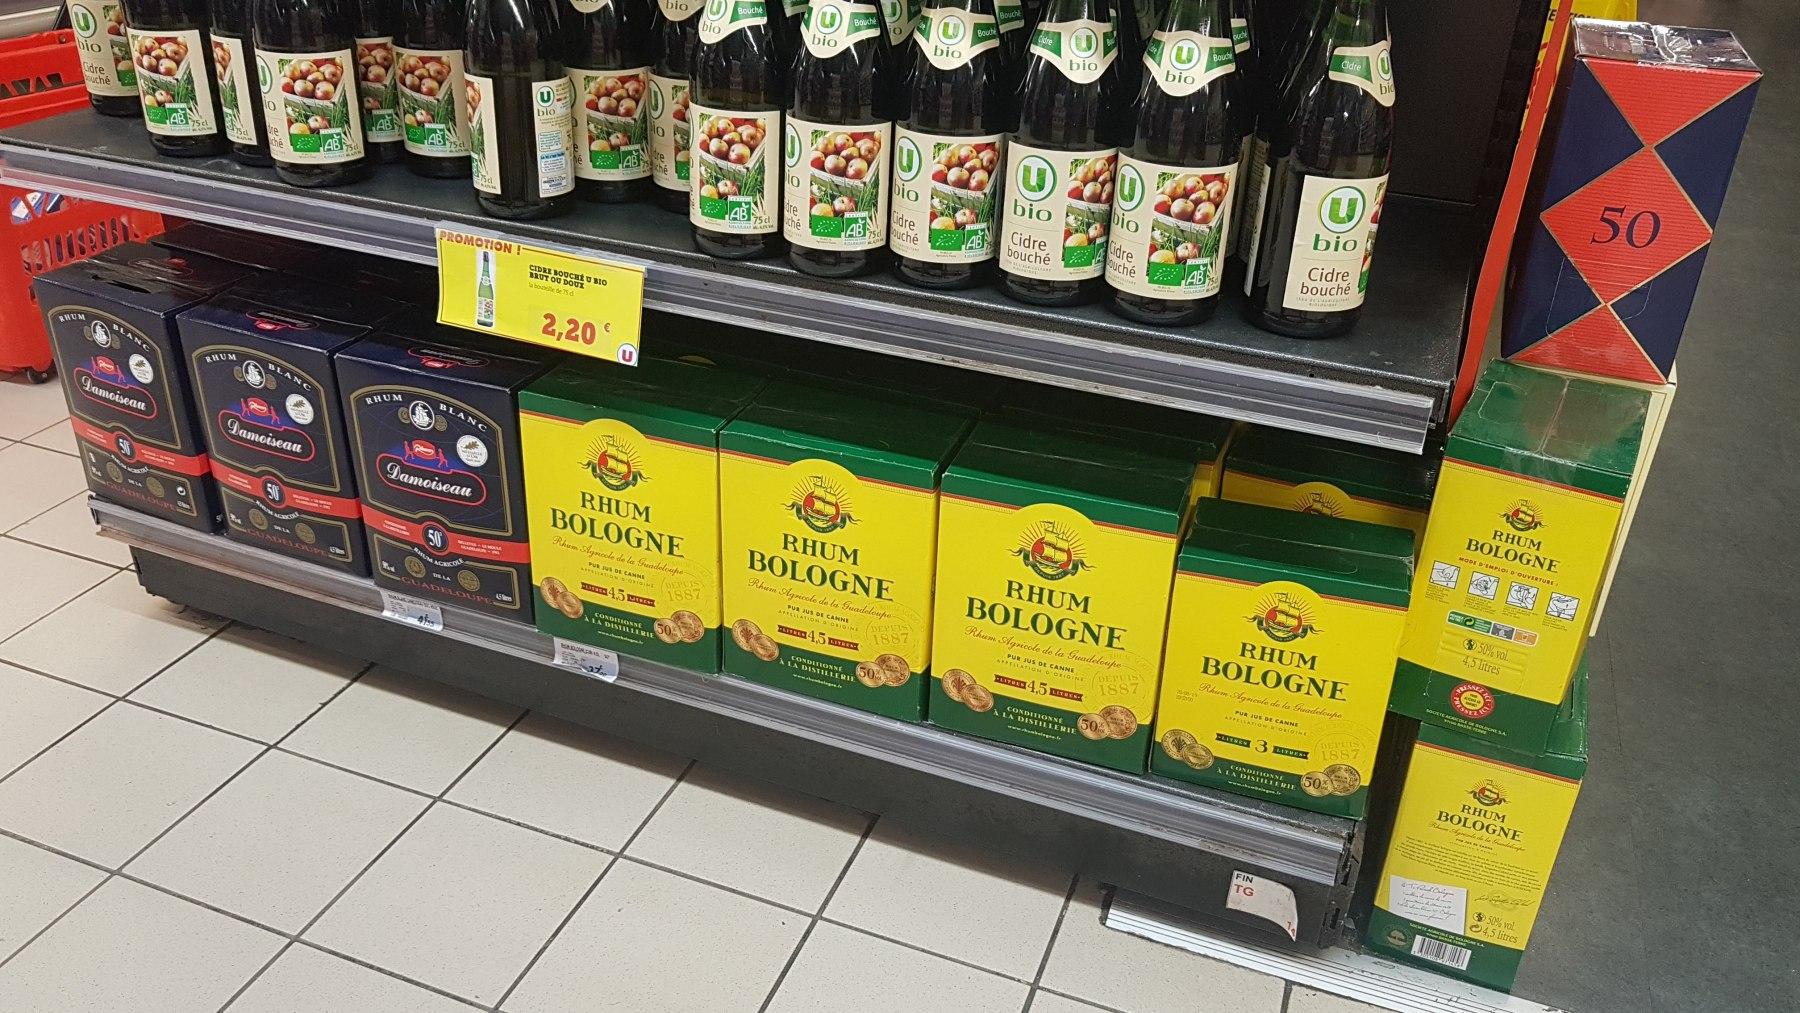 Rumový regál v supermarketu